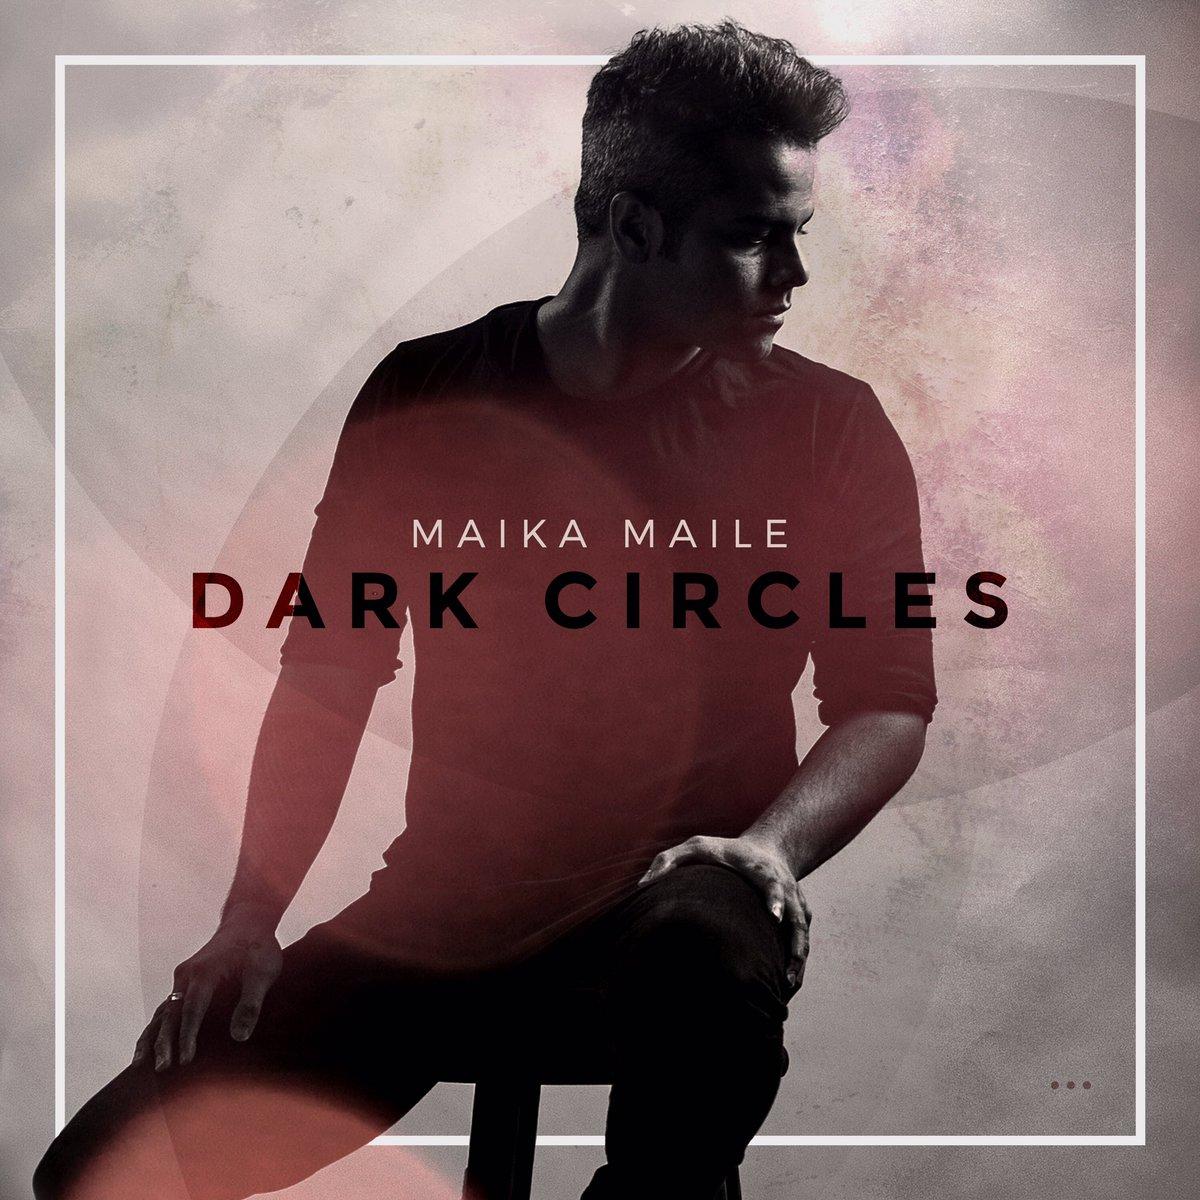 My debut single 'Dark Circles' • 10.18.16 https://t.co/Qzbx5yj85c